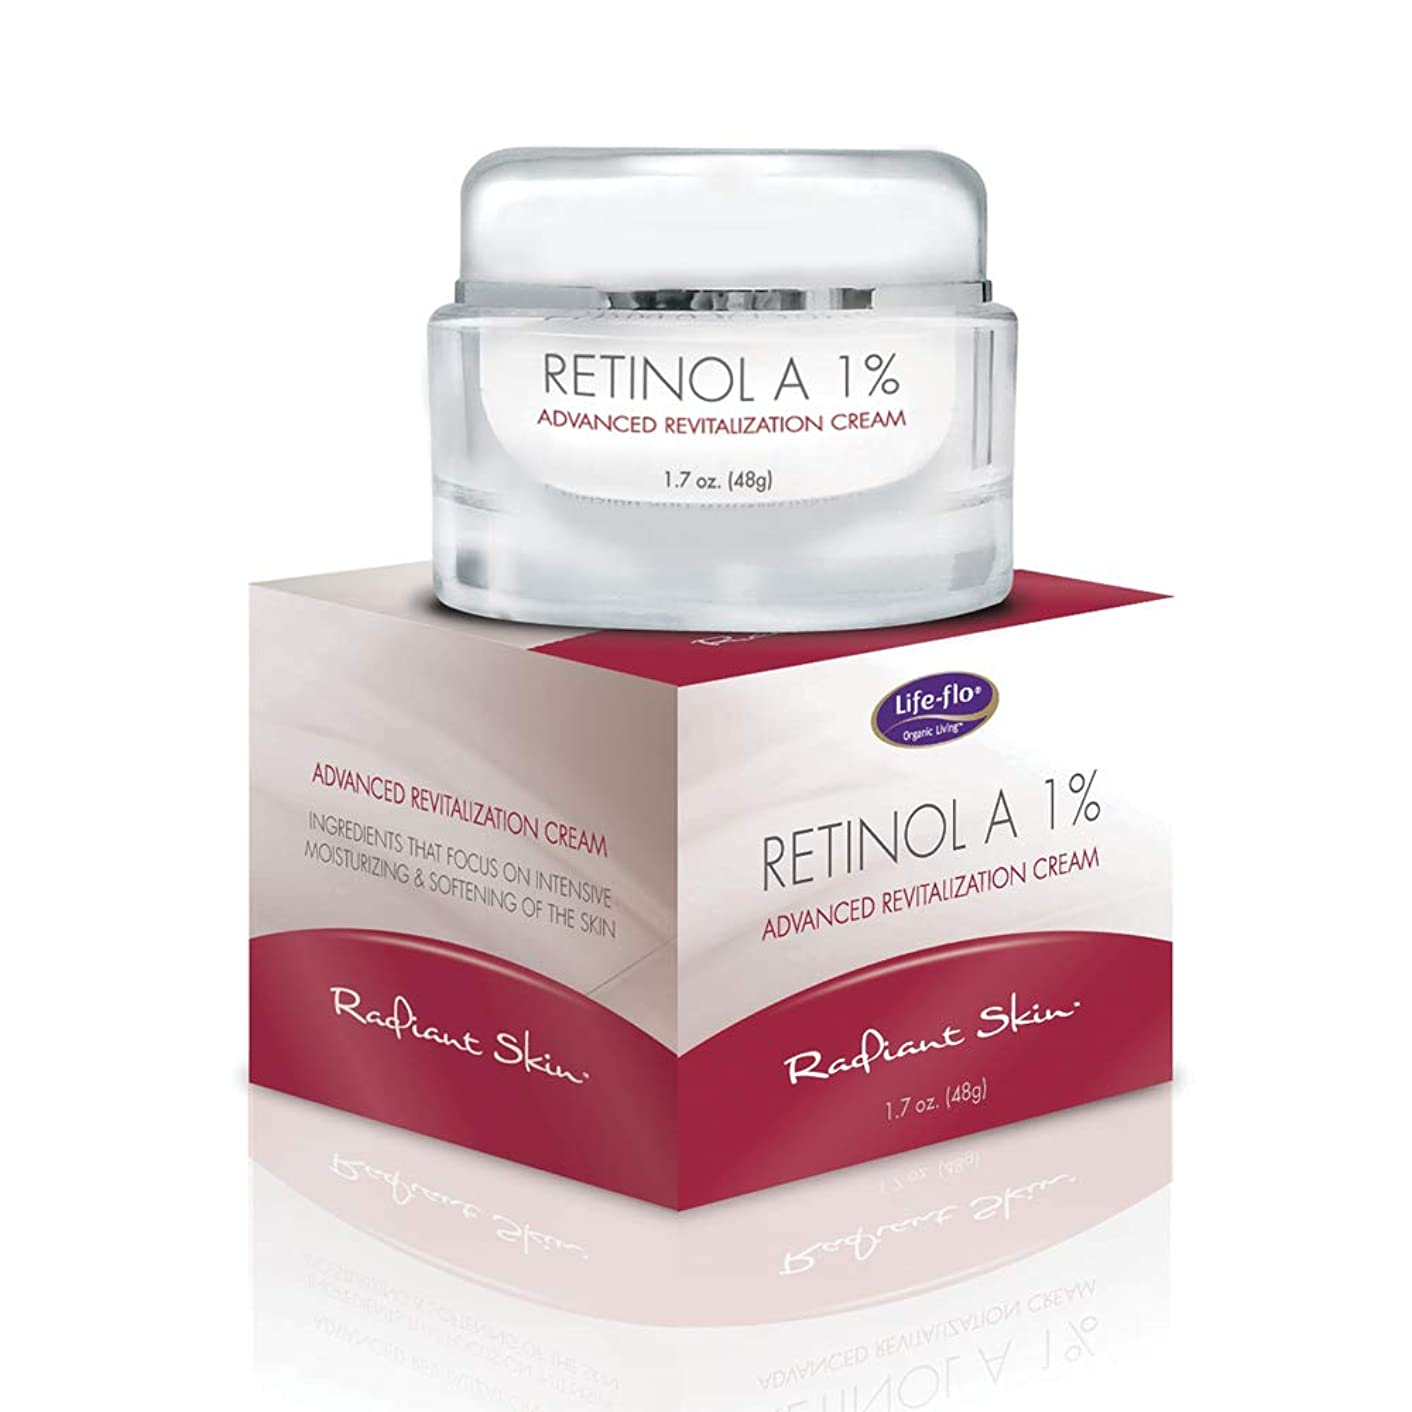 消防士感じ殺人者Retinol A 1%, Advanced Revitalization Cream, 1.7 oz (48 g)